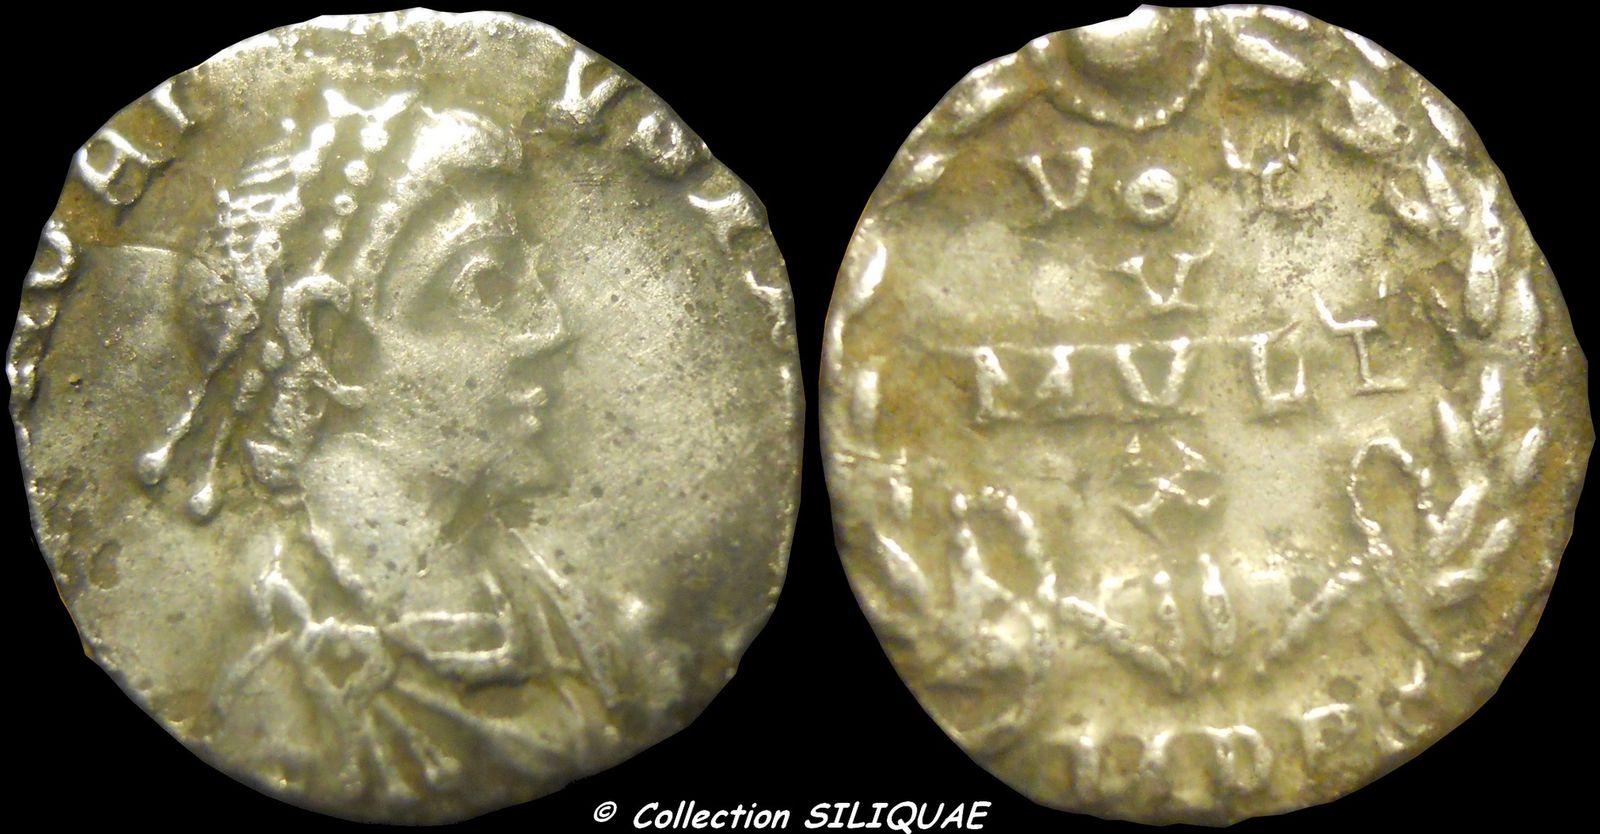 Collection Siliquae - Page 16 HONORIUS-RIC26jpg